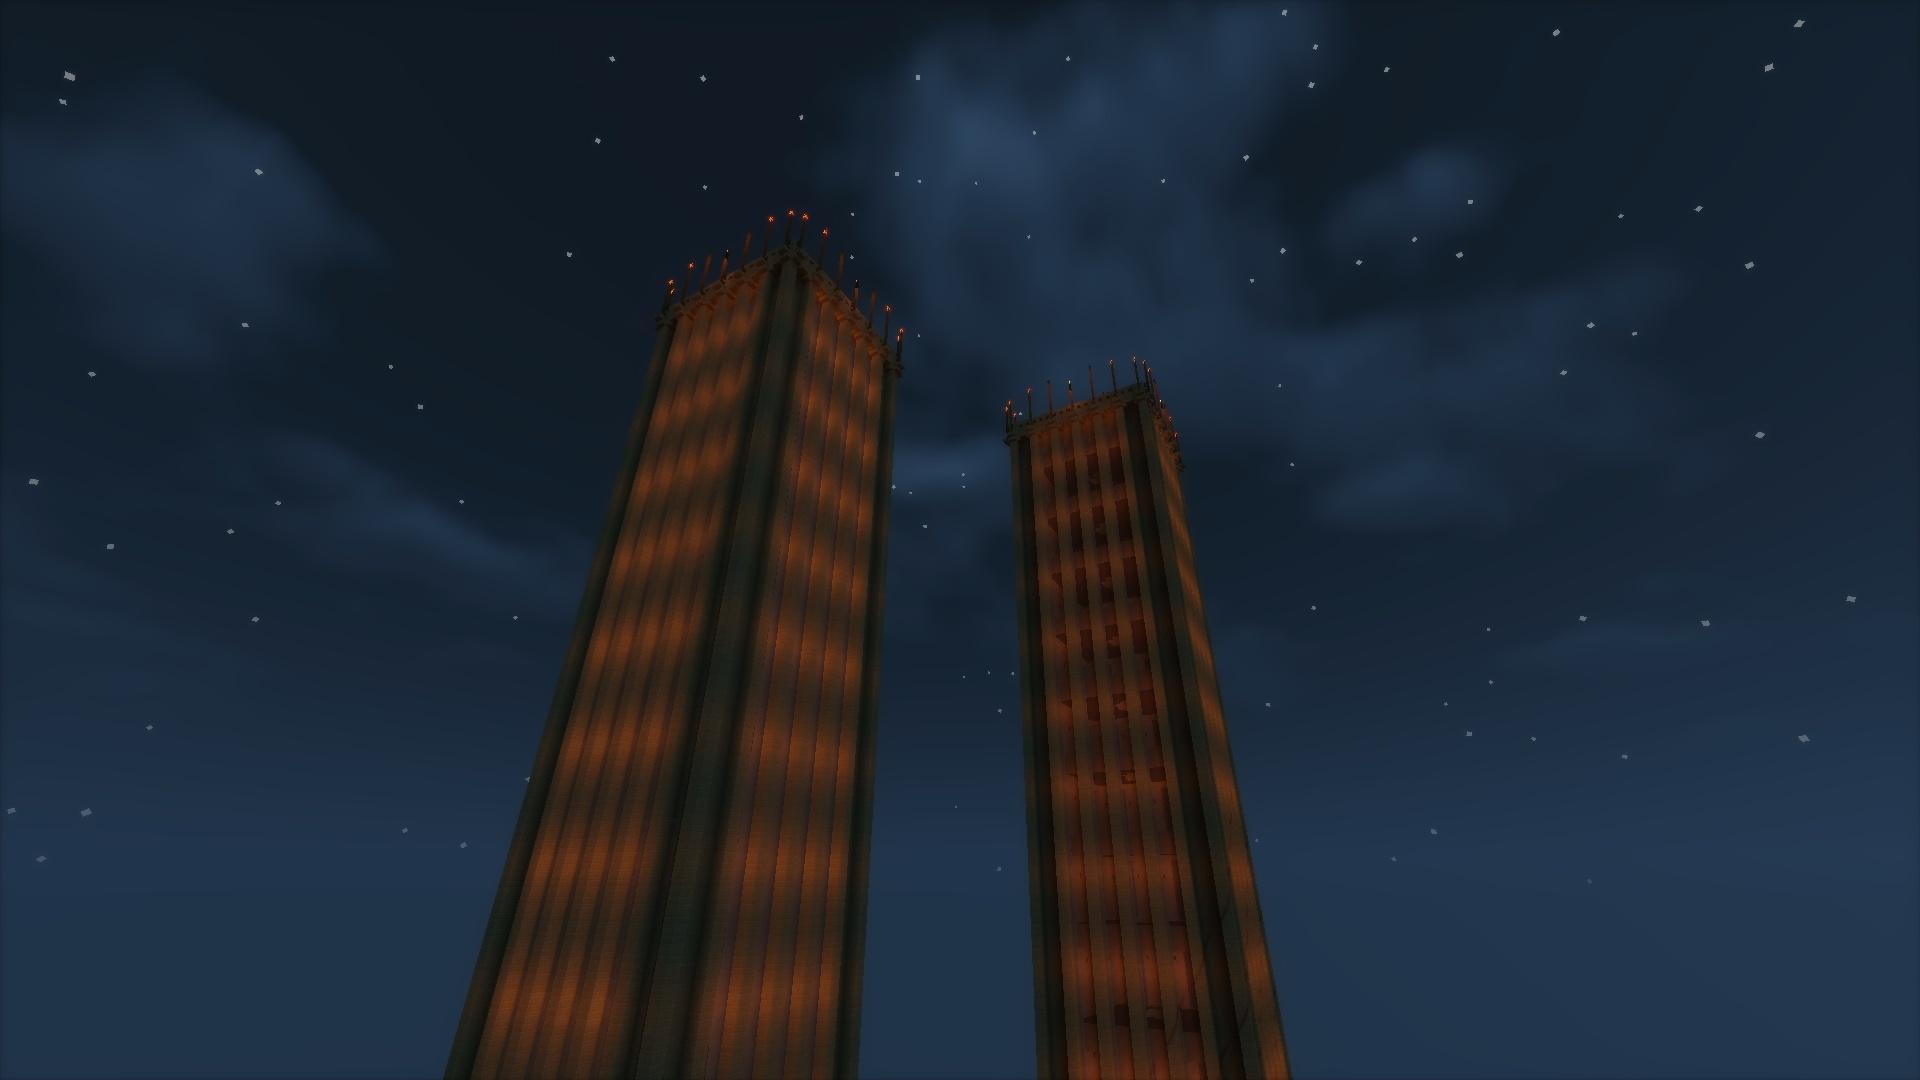 ça ne serait pas les tours du World Trade Center ça ? O=